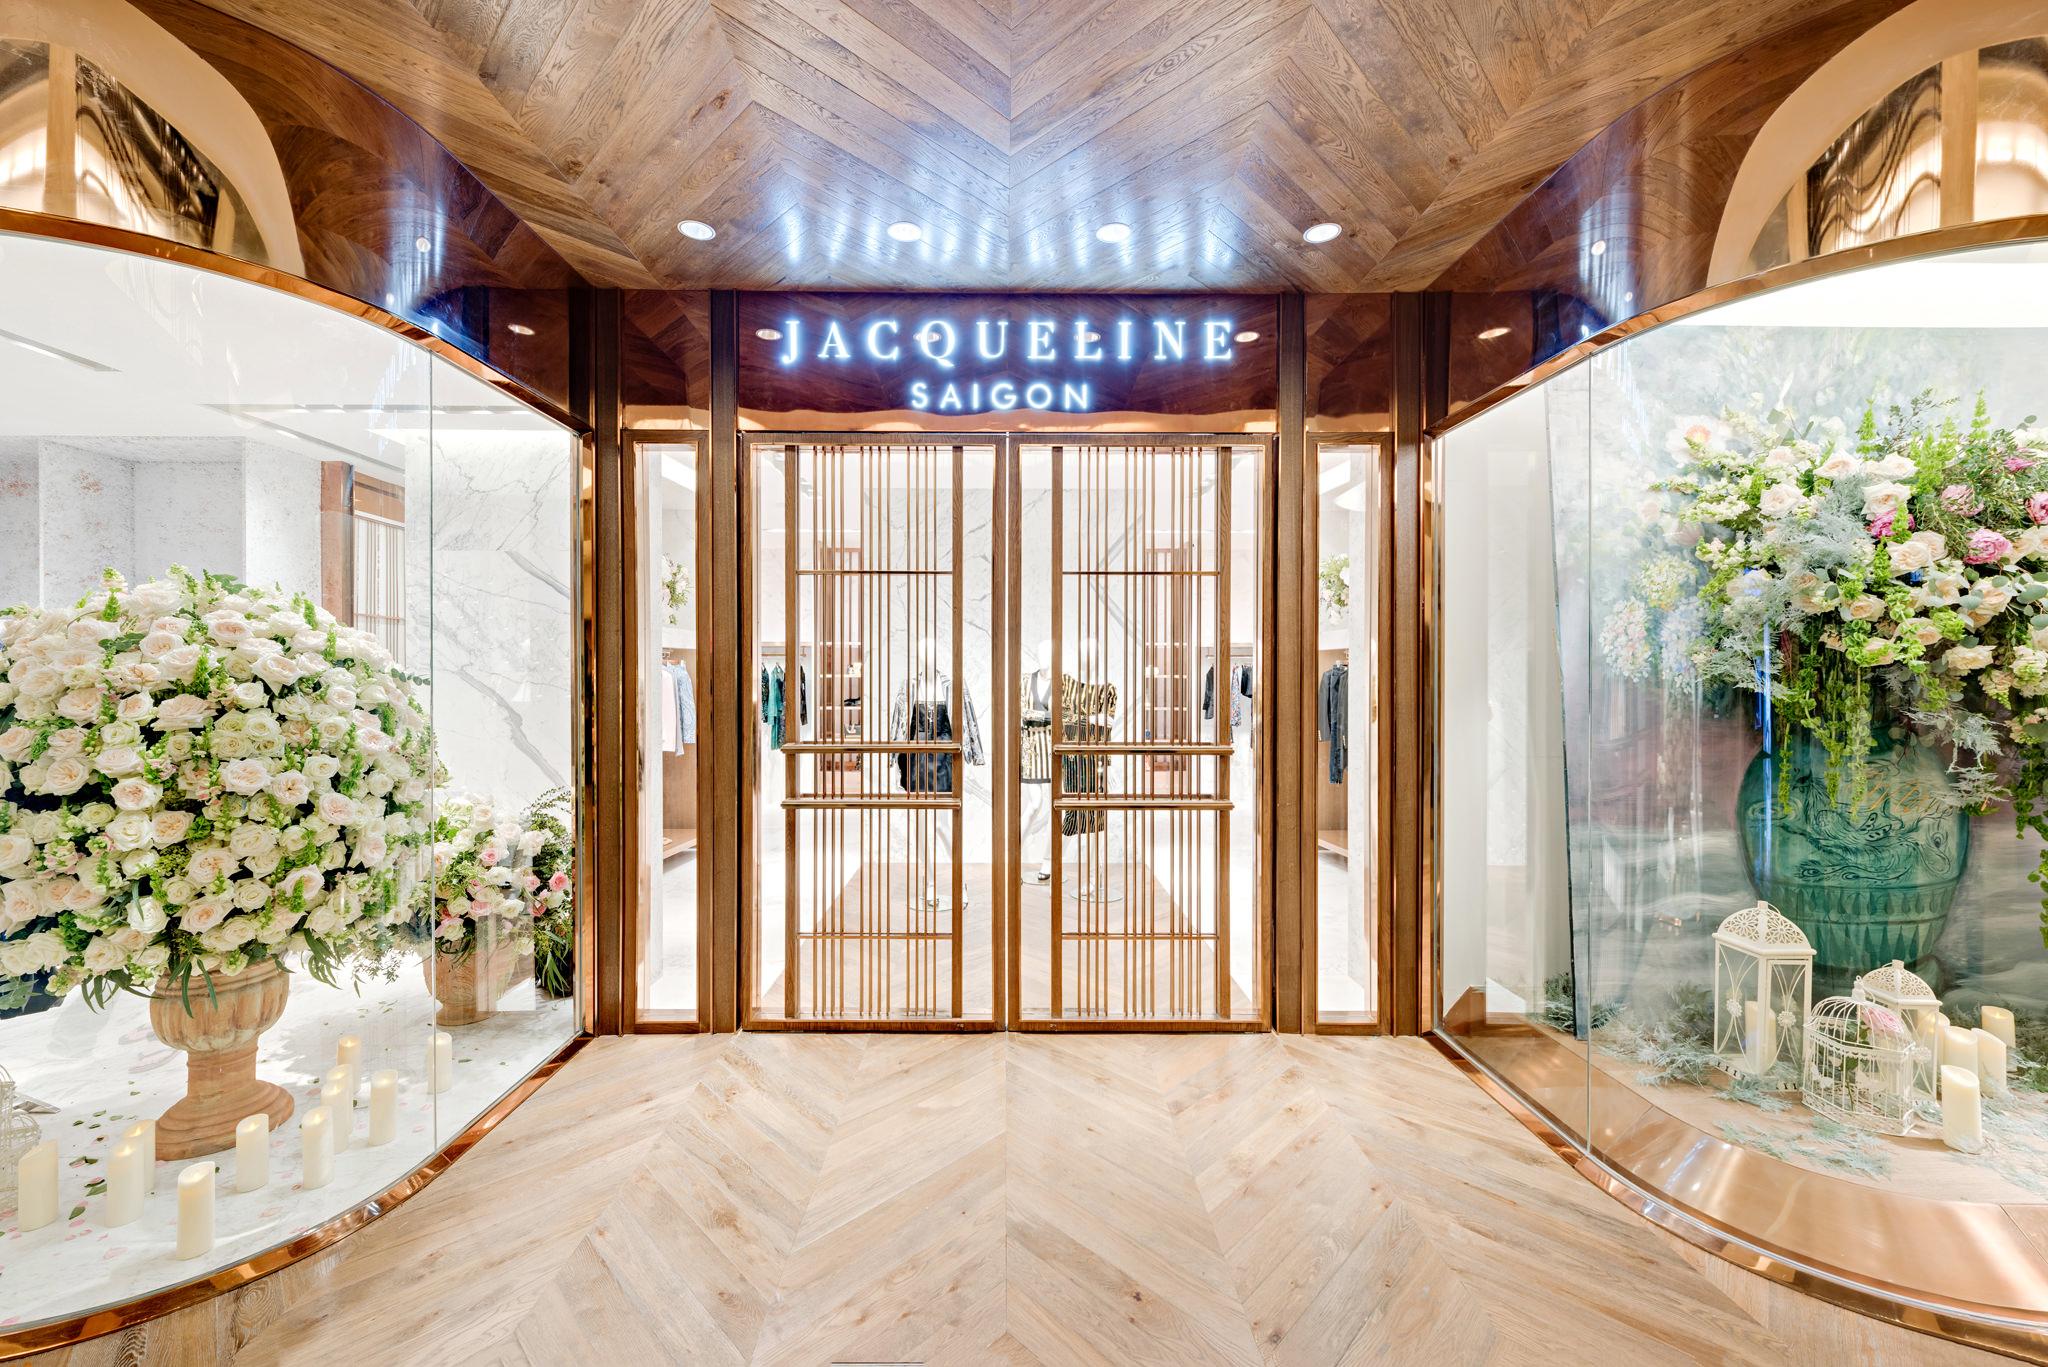 20161224 - Jacqueline - HCM - Commercial - Interior - Store - Retouch 0010.jpg